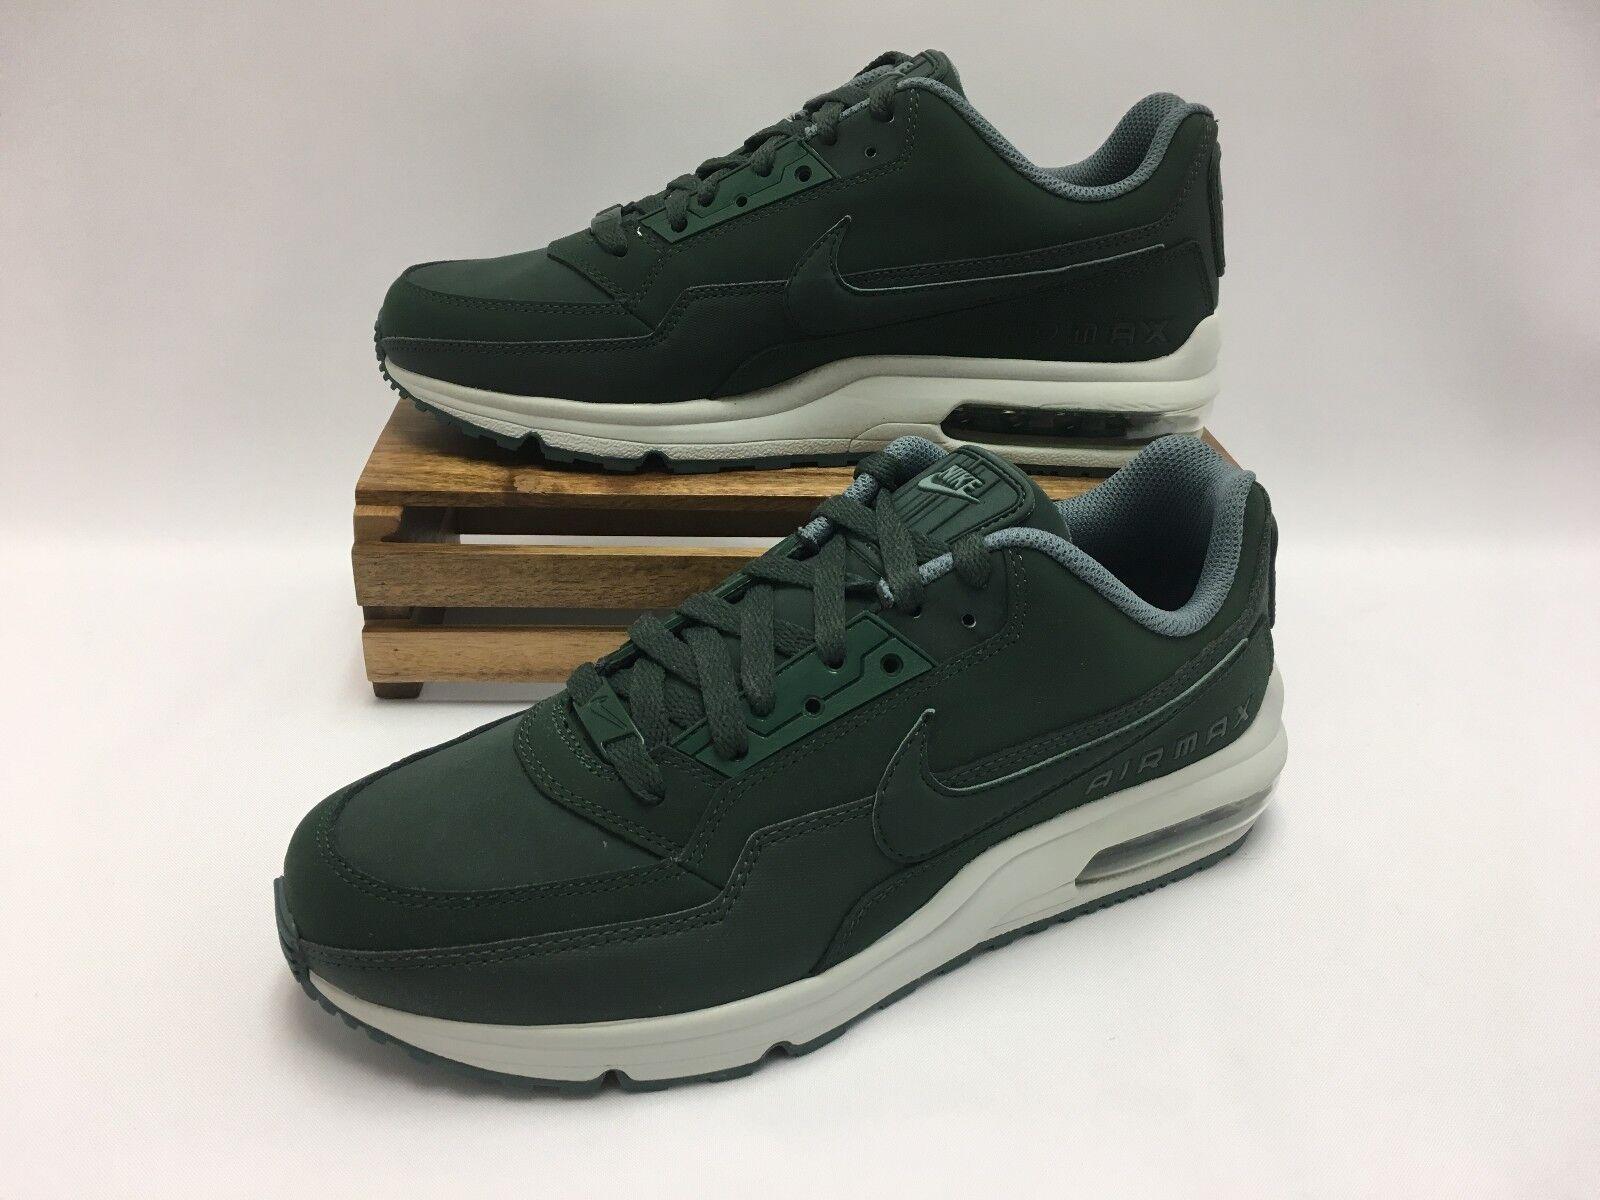 Nike Air Max LTD 3 Running Shoes Grove Green White 687977-303 Men's Size 10 NWOB